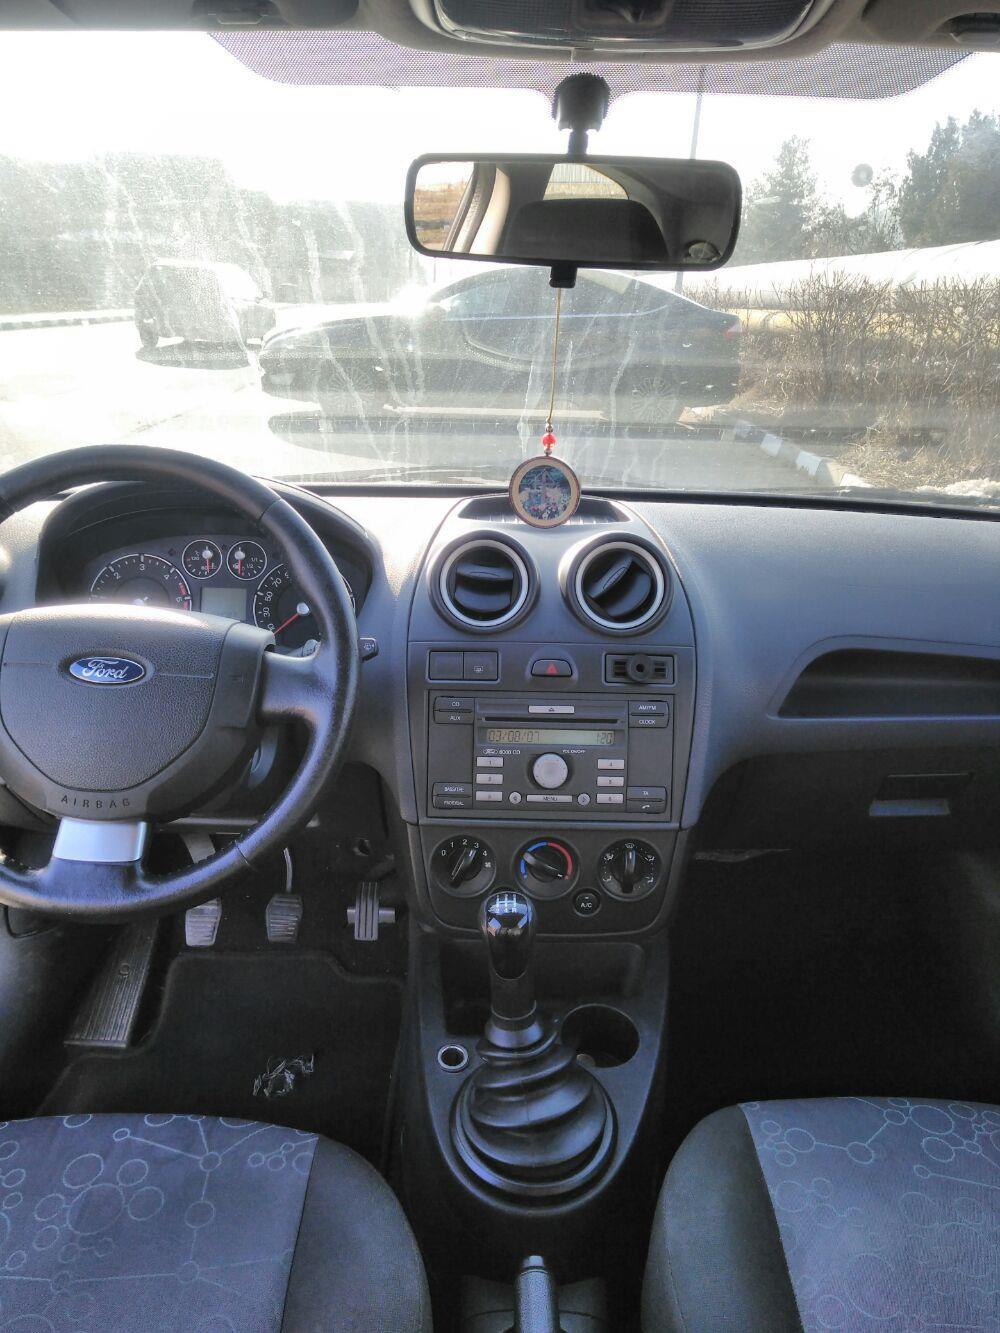 Ford Fiesta 1.4 tdi an 2008 Rar făcut  - imagine 5